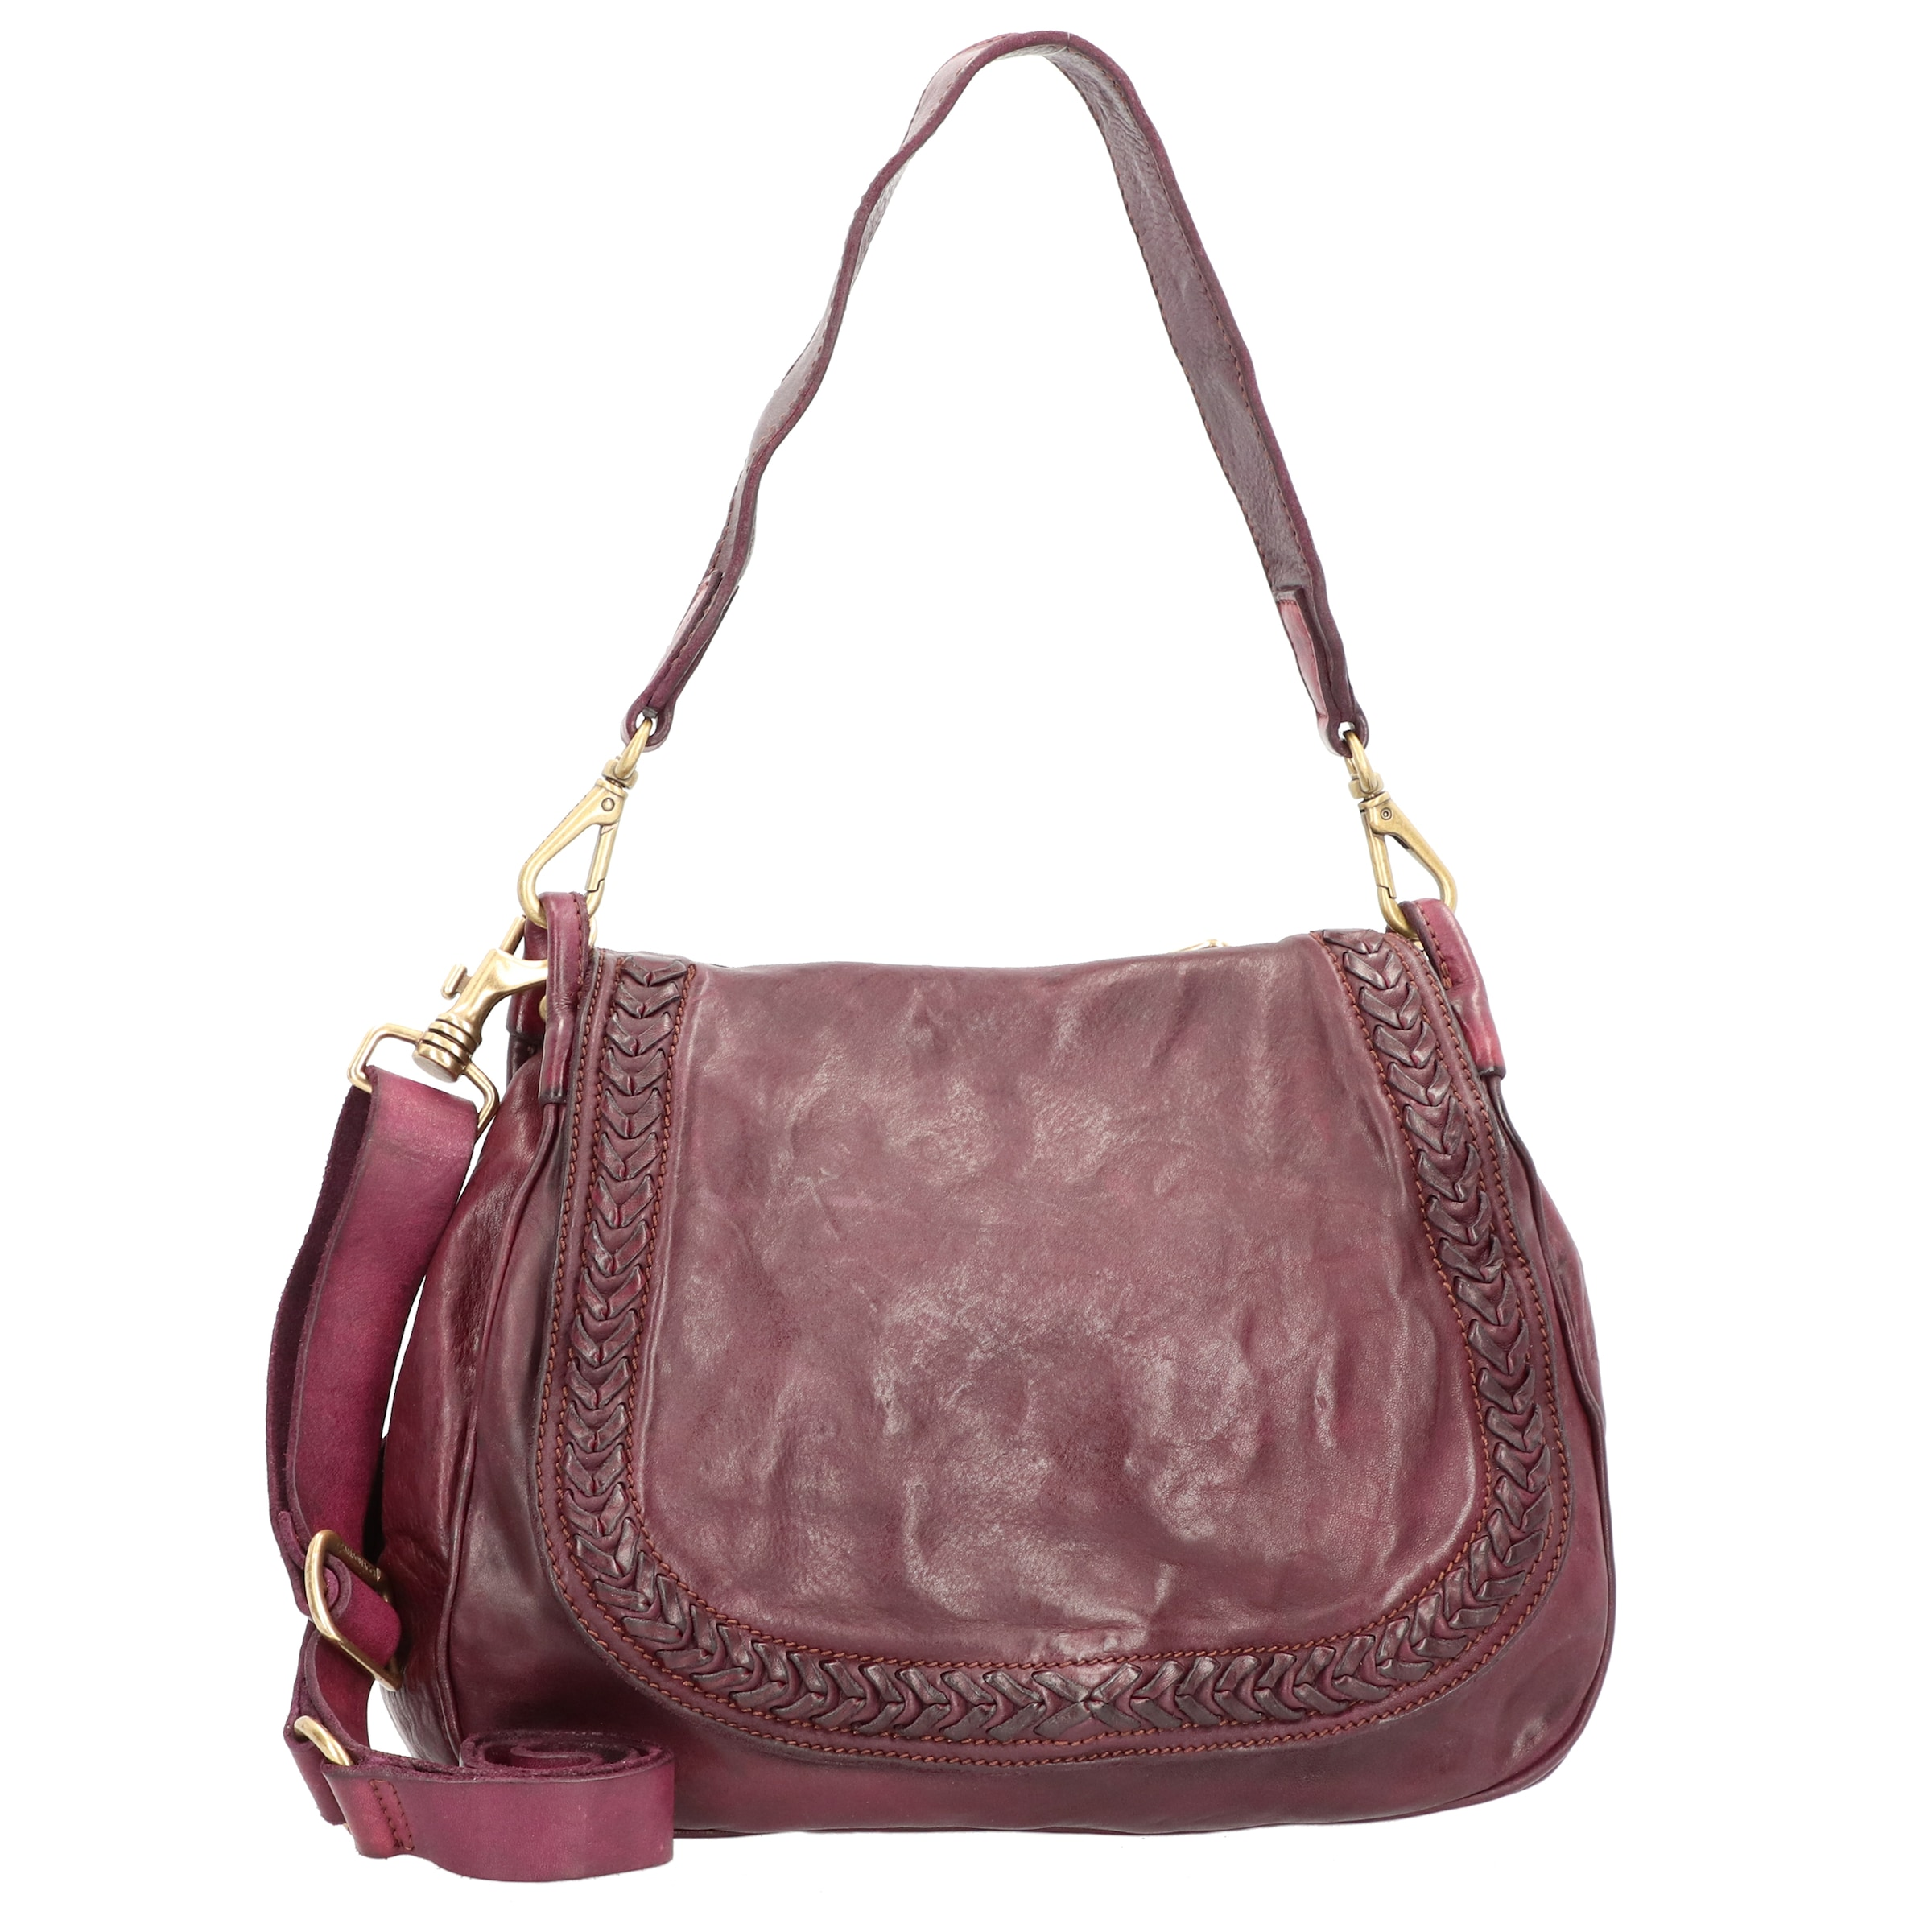 Handtasche Campomaggi Lila In Handtasche Handtasche Campomaggi In Campomaggi In Lila Lila 0wnO8kP